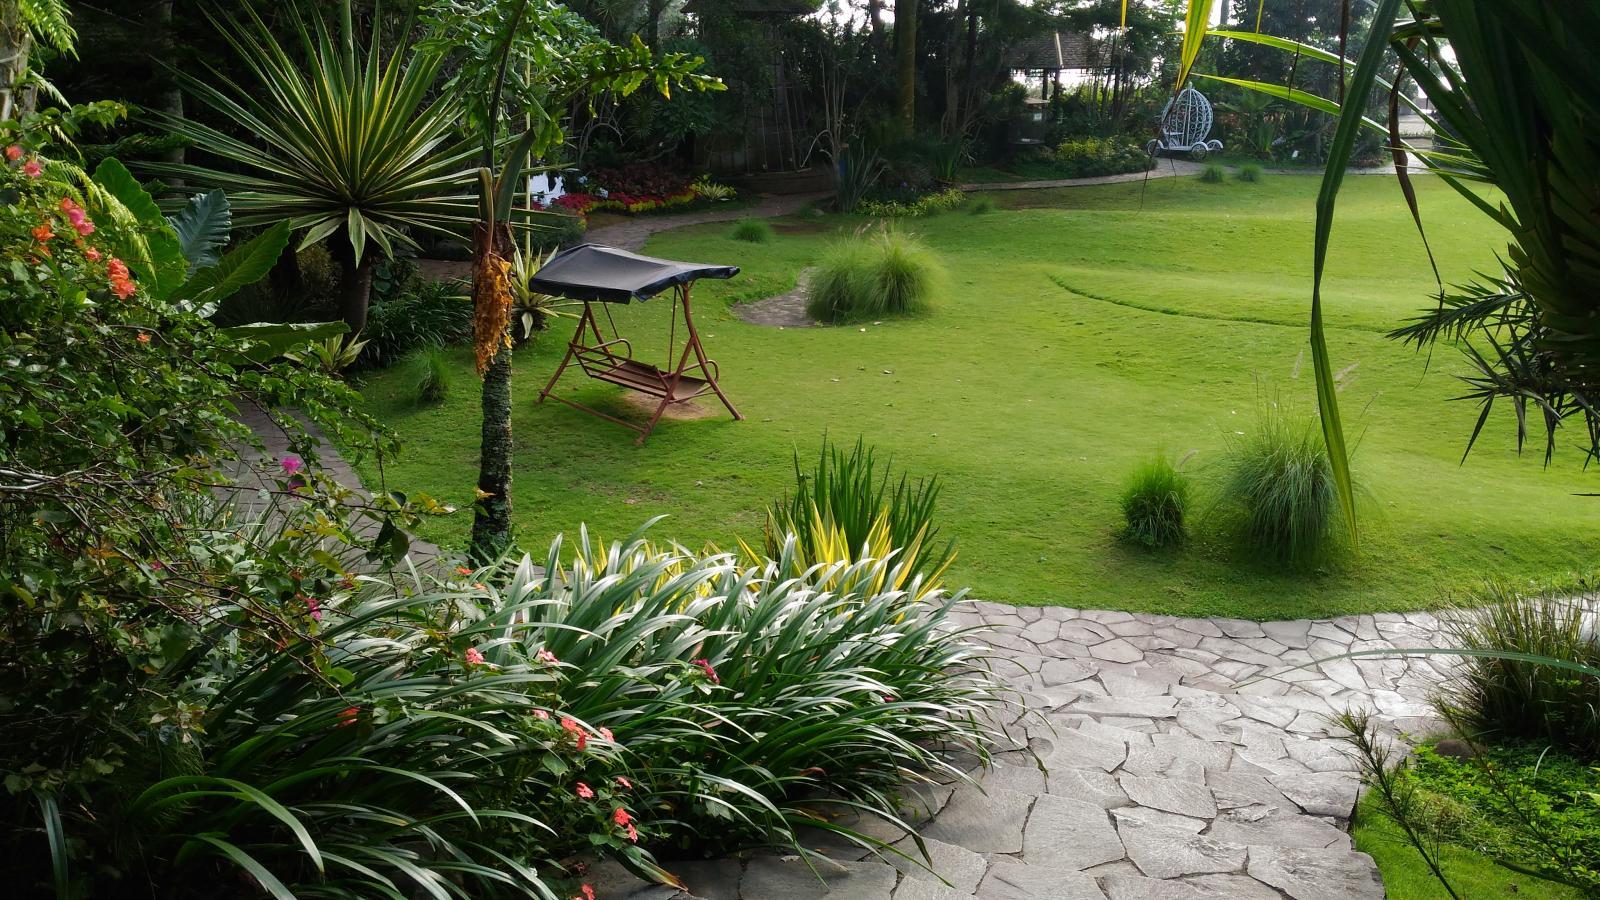 Eden Park Susan Spa & Resort (La Kana)